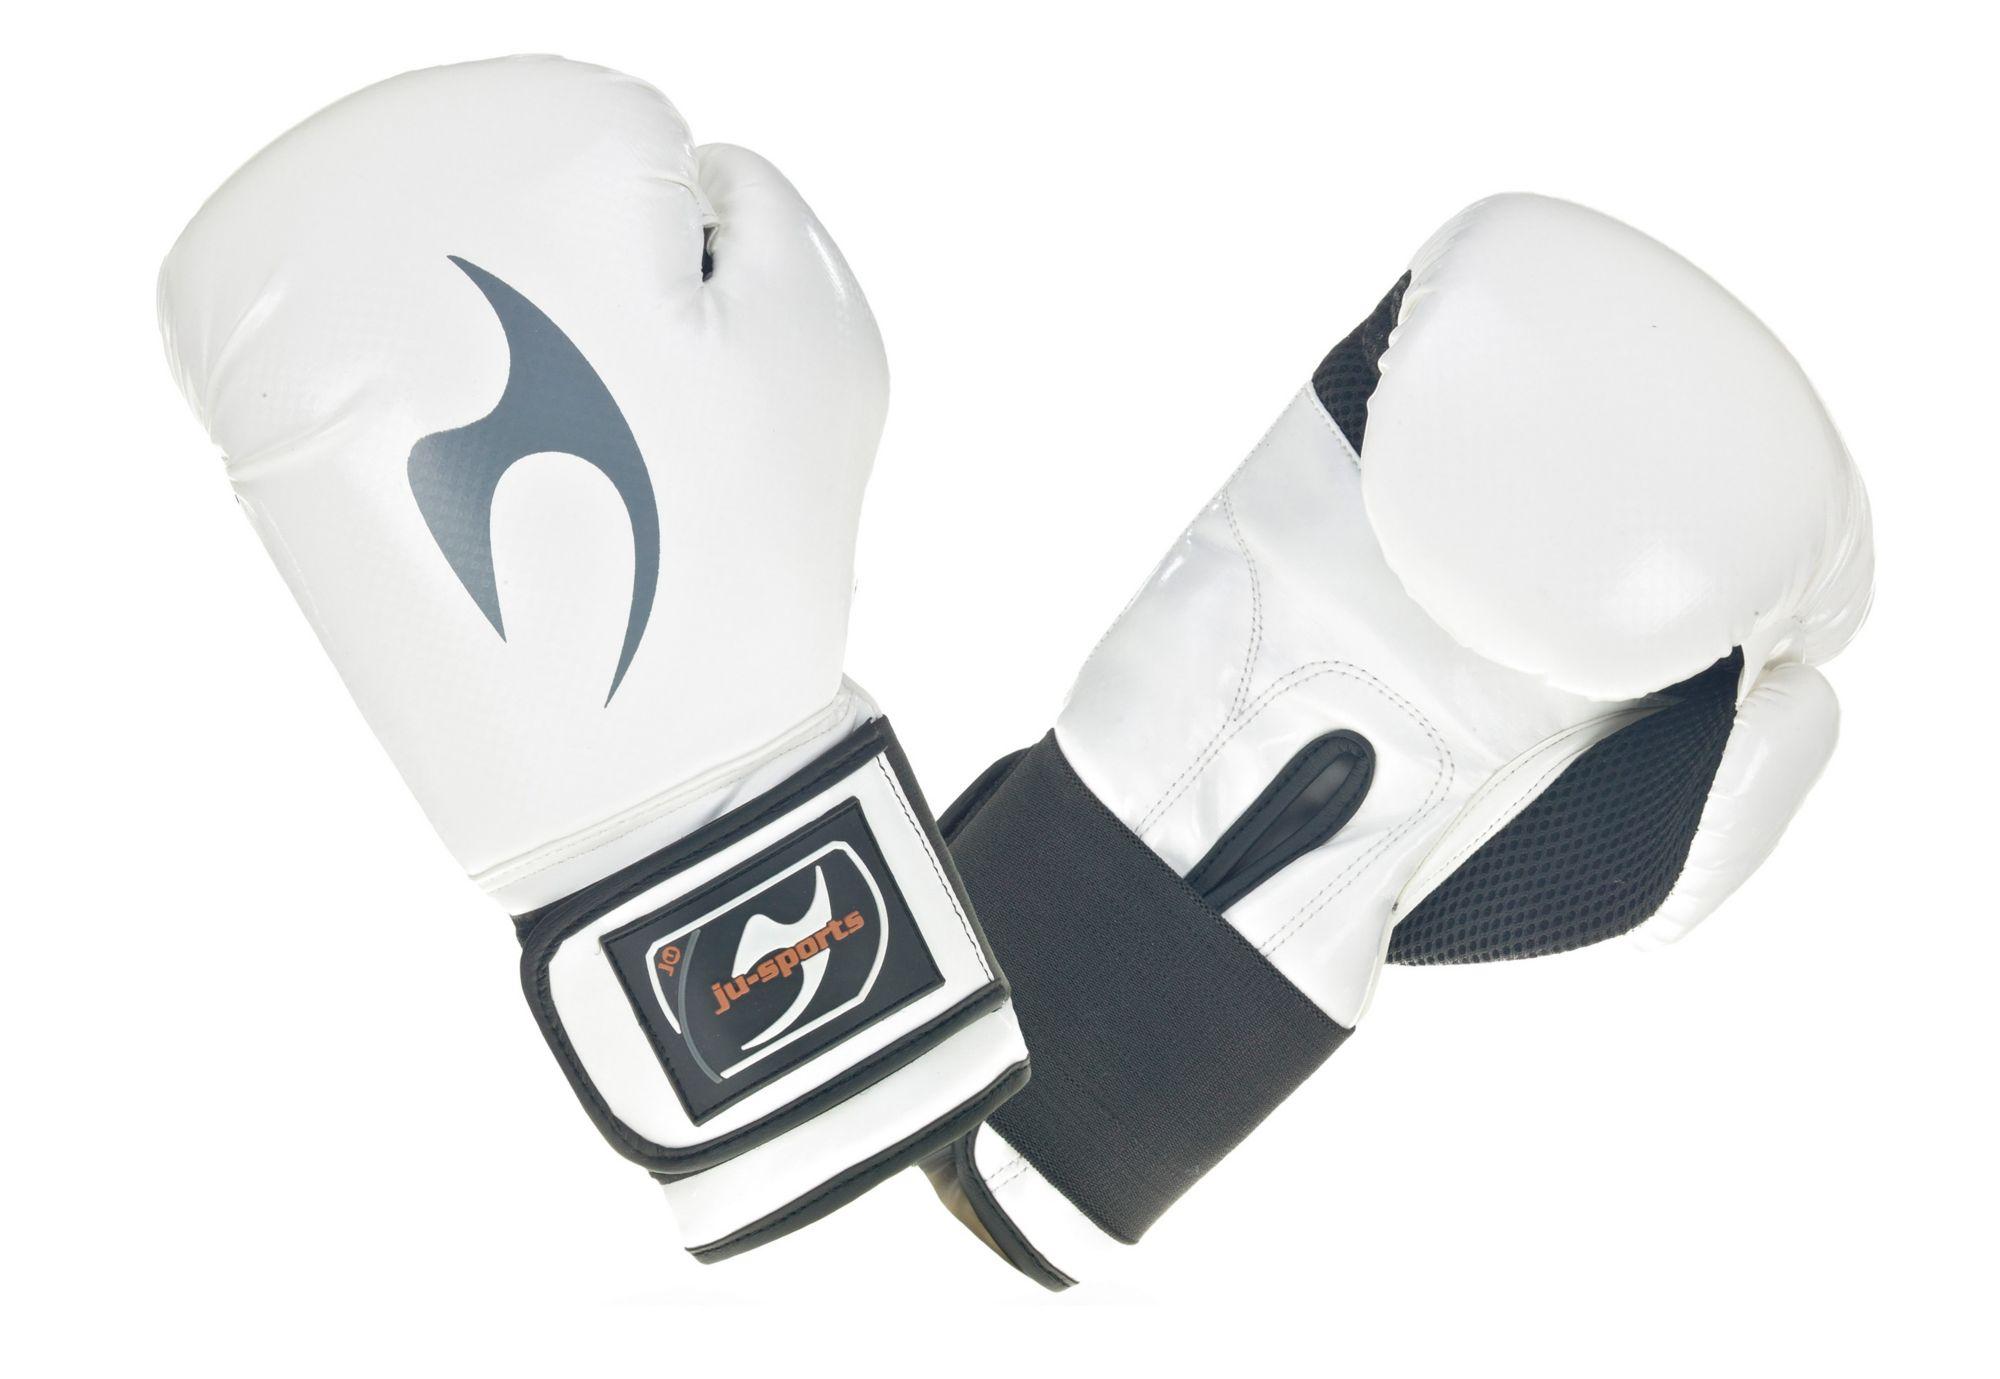 JU SPORTS Boxhandschuh, »Allround quick aircomfort«, Ju-Sports